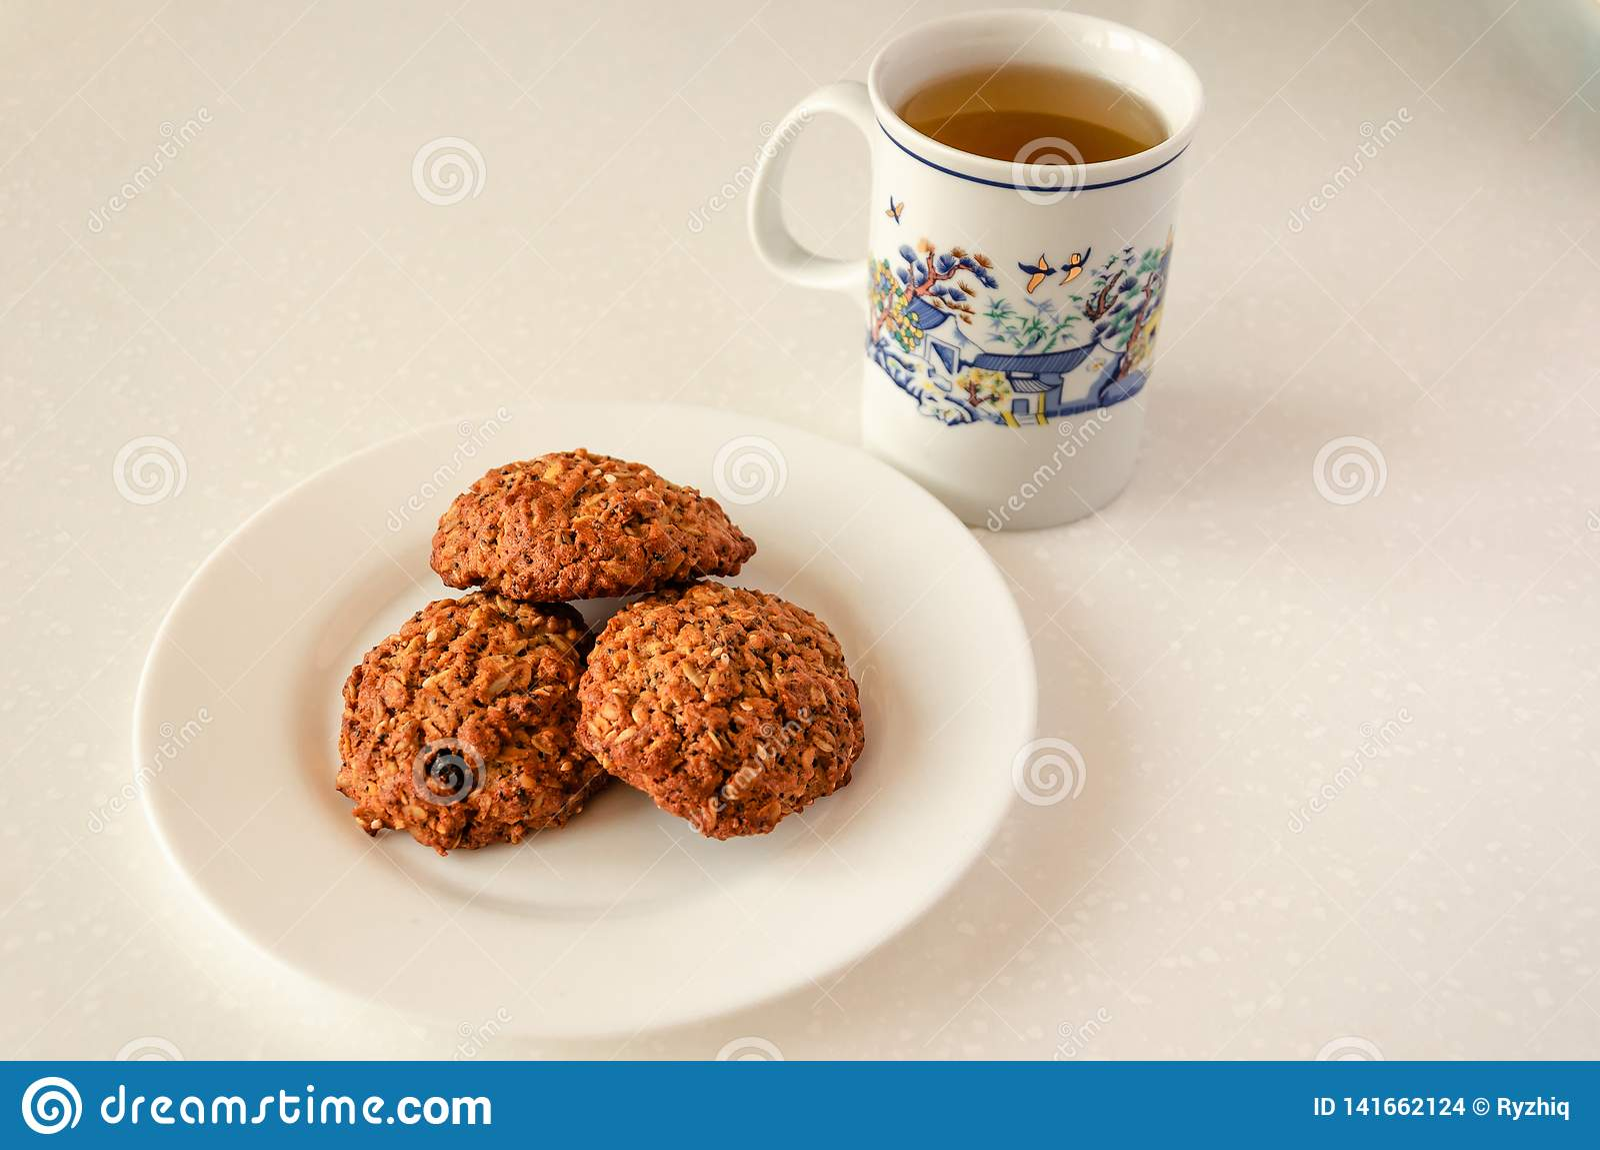 Oat cookies and green tea